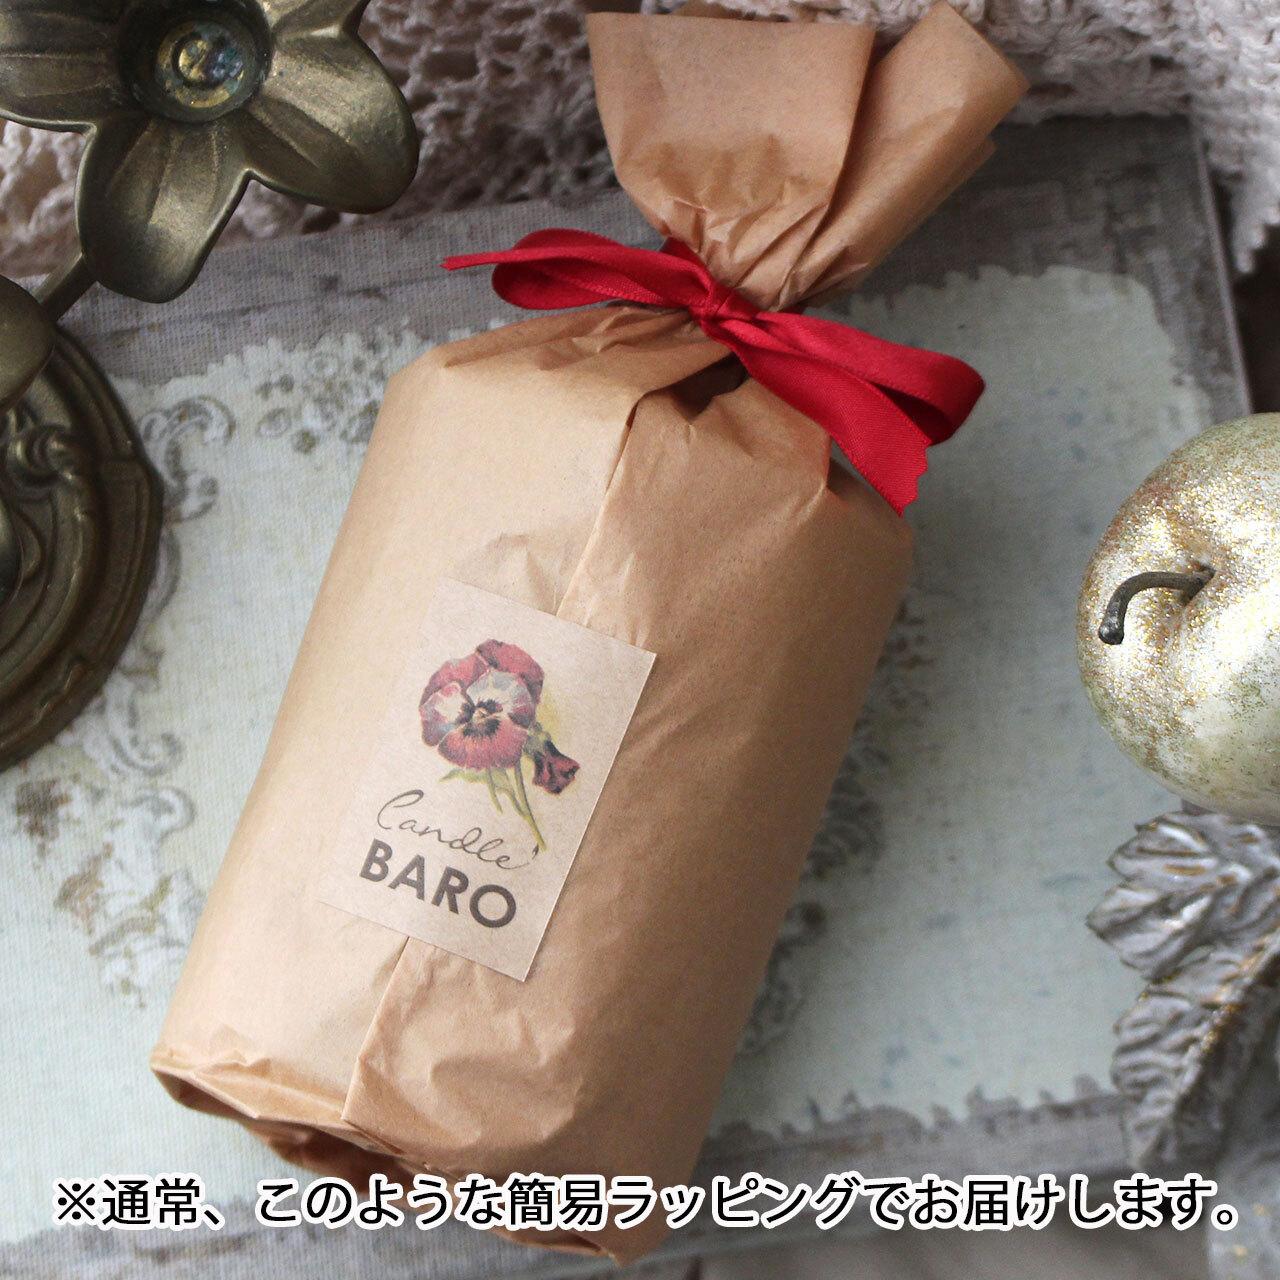 【UROCO】ピラーキャンドル UP001